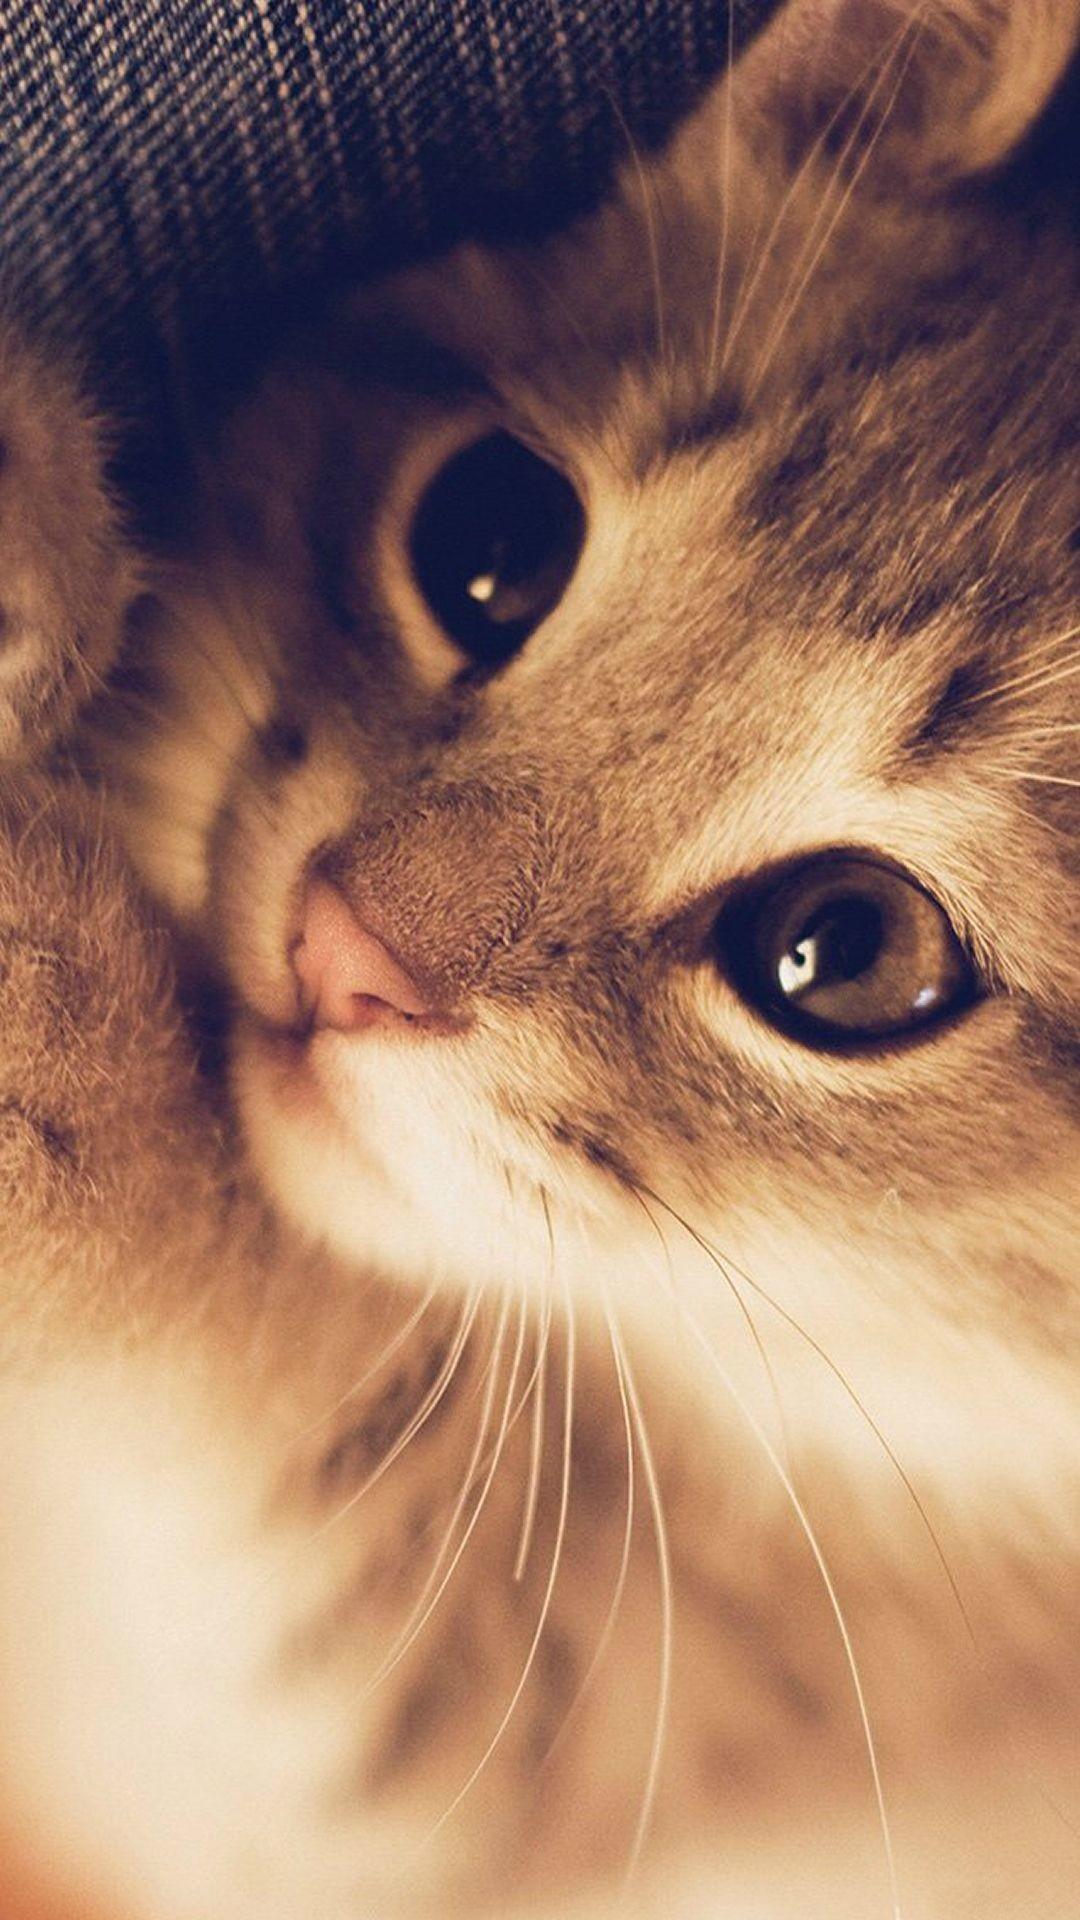 Res: 1080x1920, Cute kittie